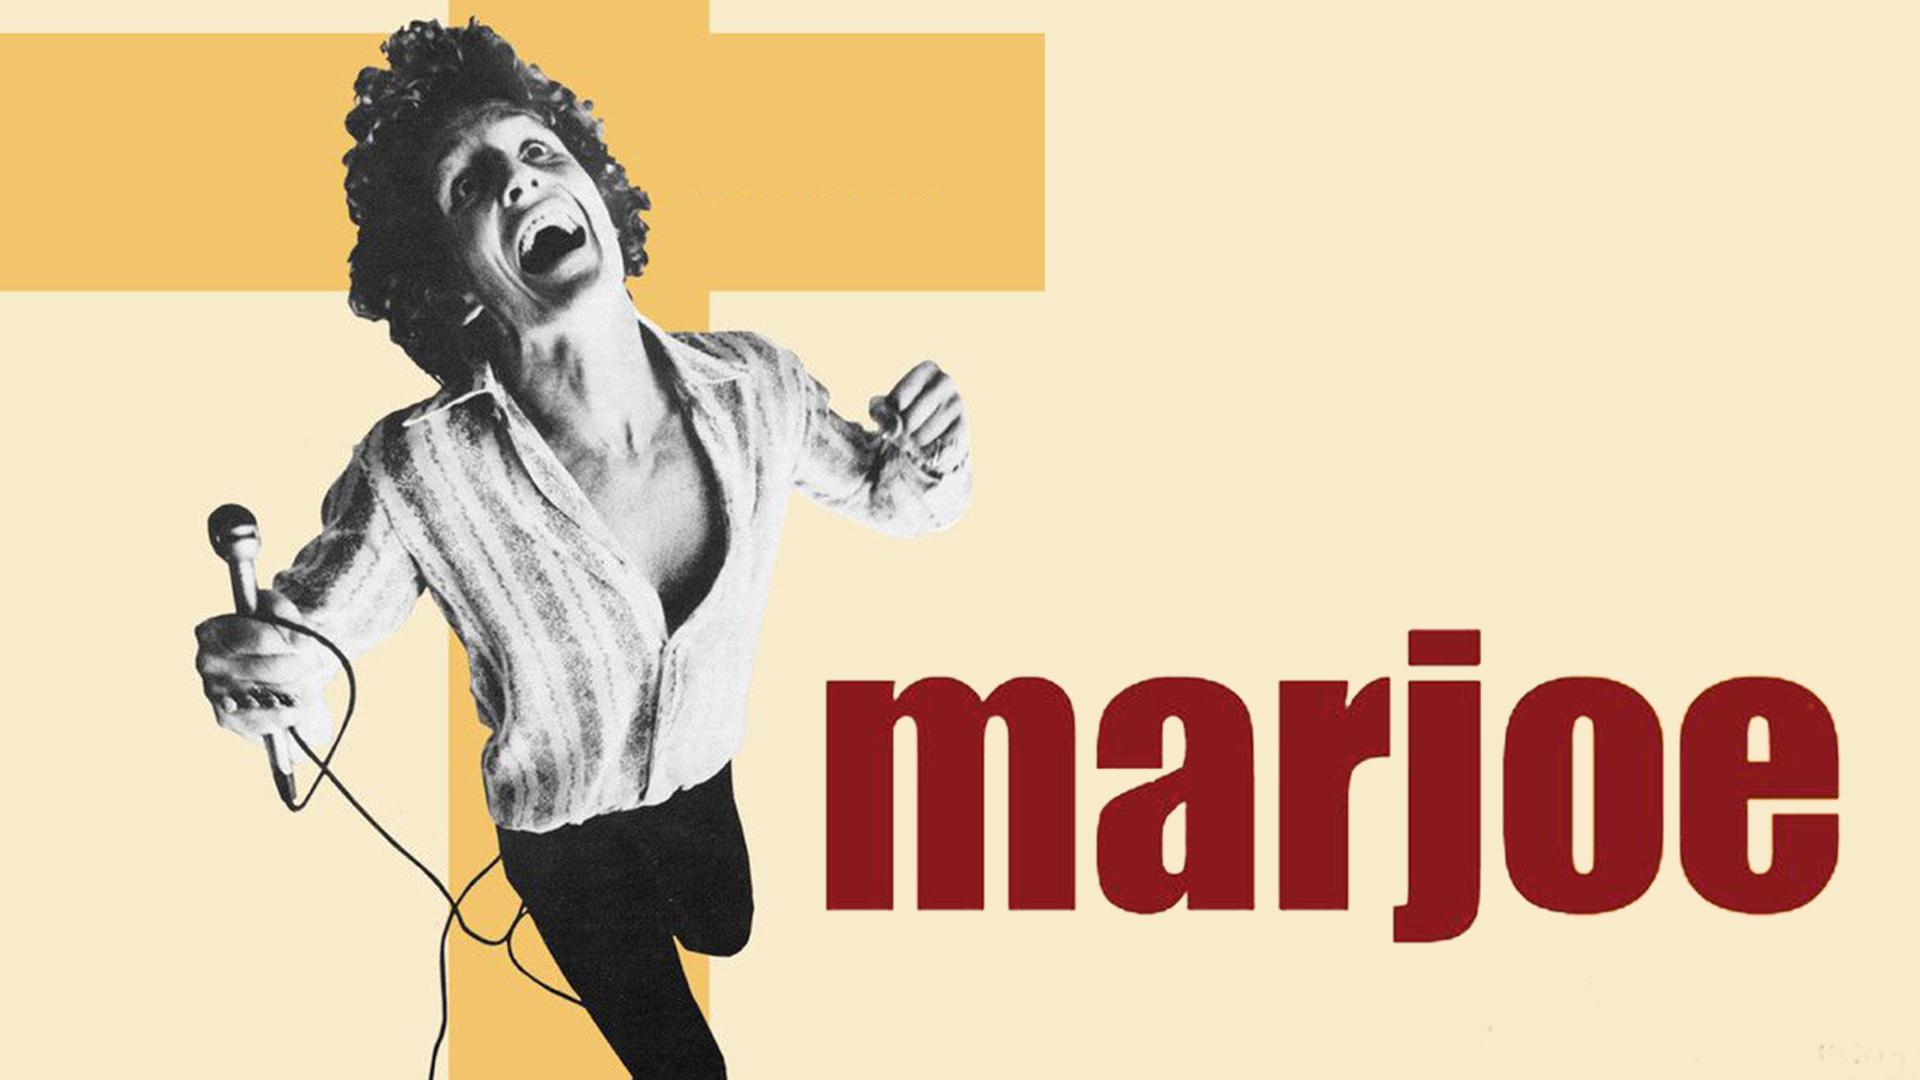 Marjoe